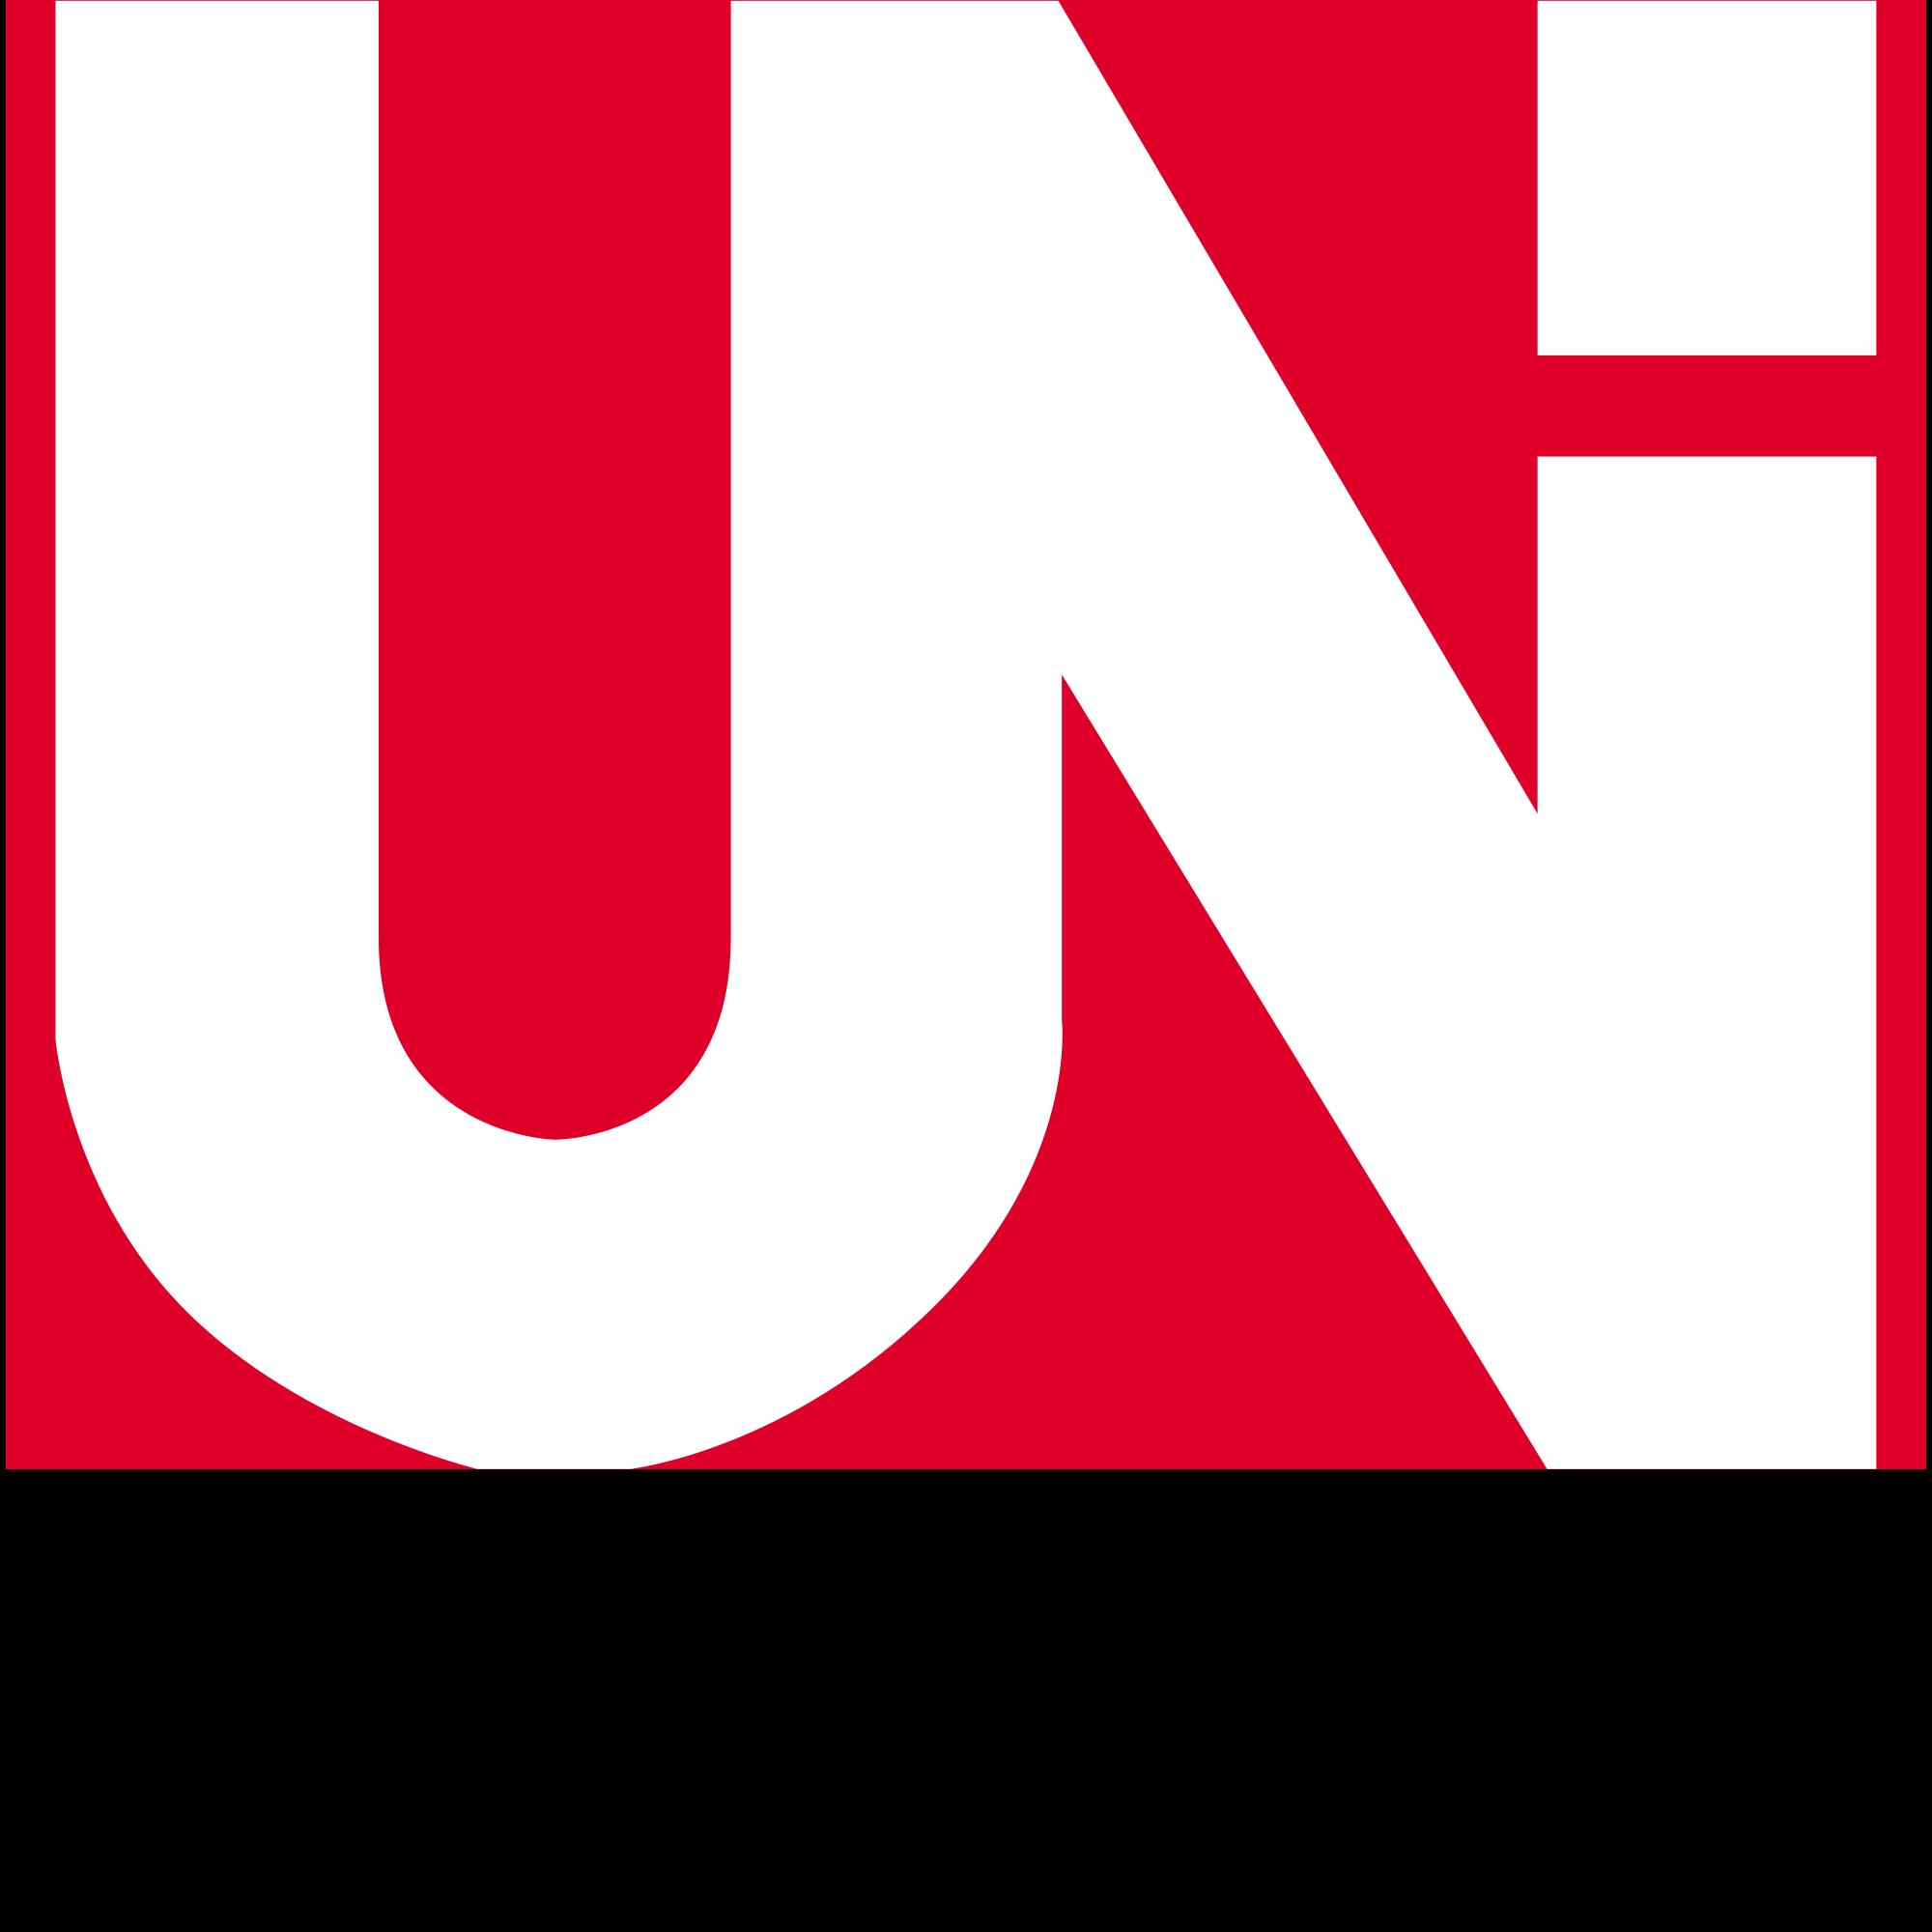 Working with Unicode symbols